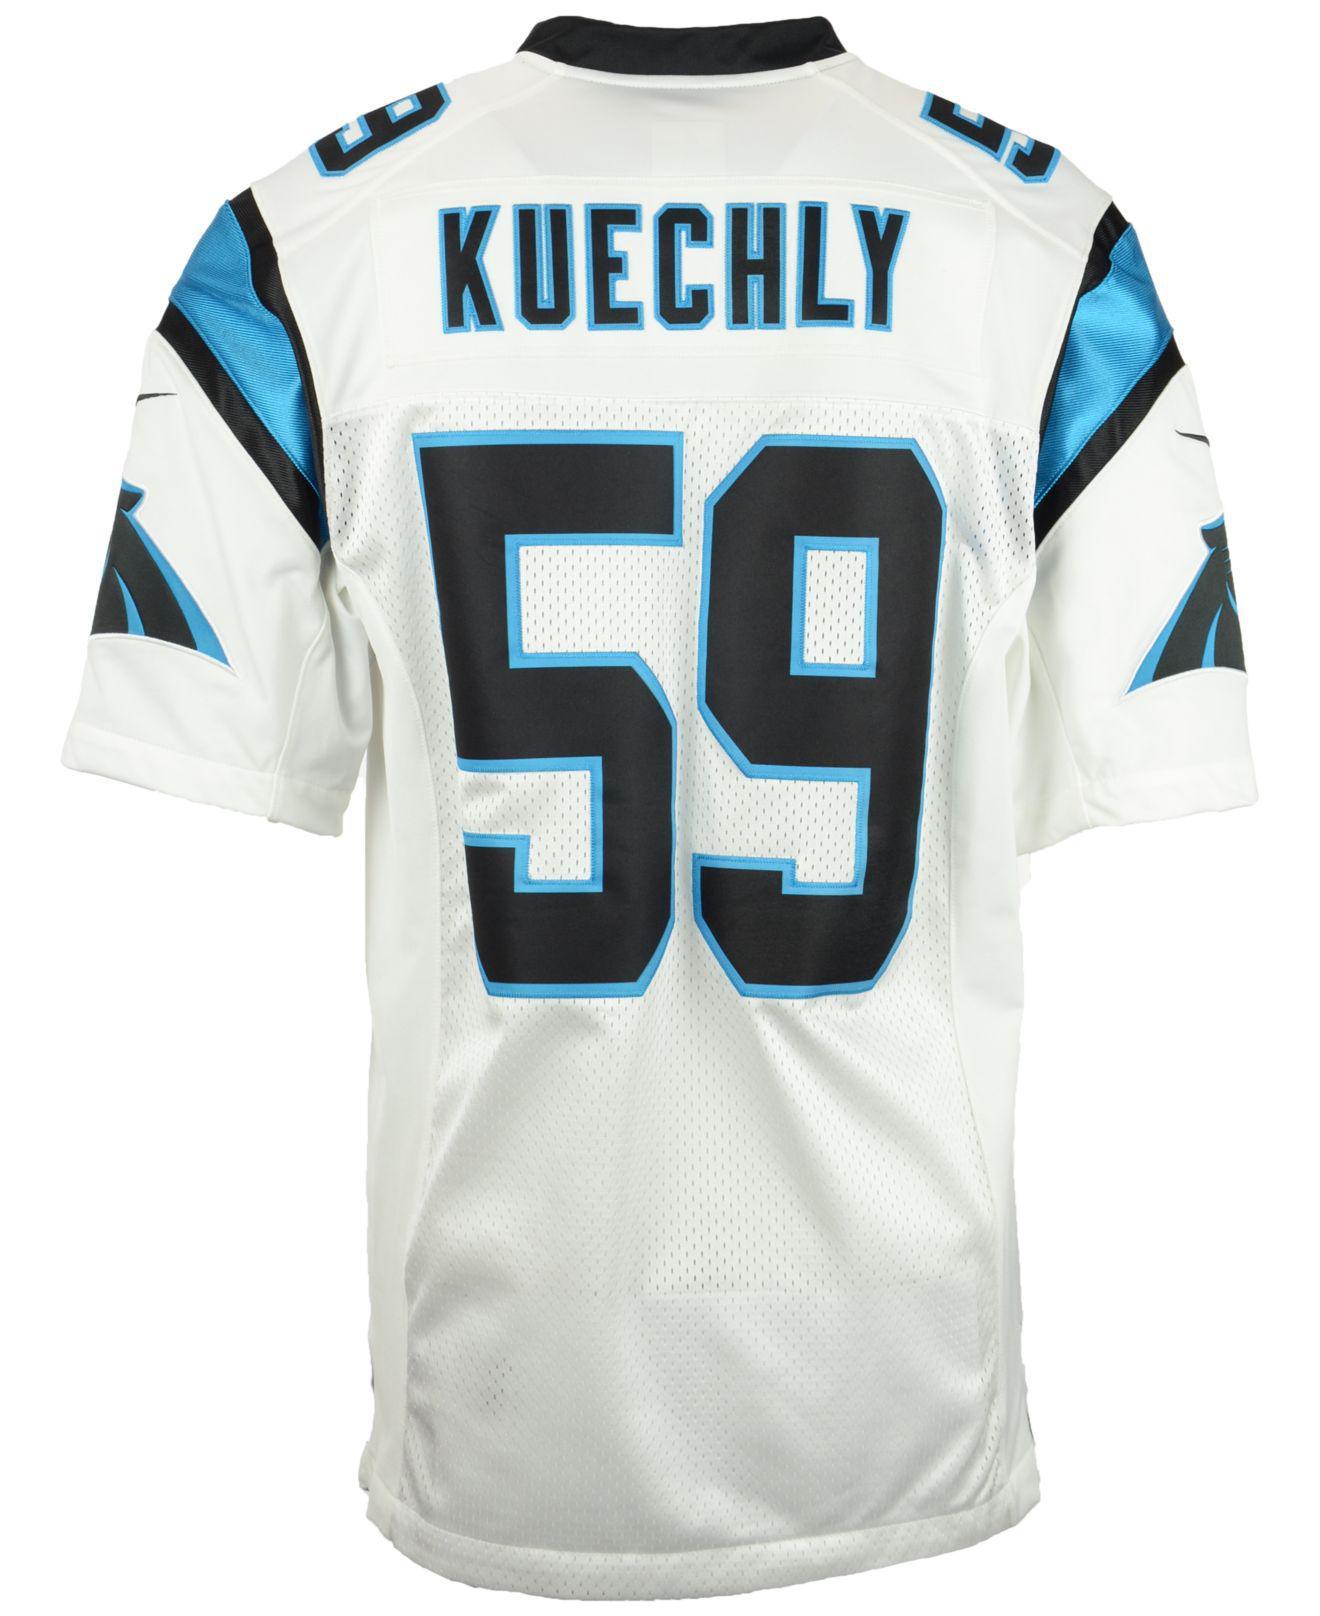 e6bb21f1c42 Nike Men's Luke Kuechly Carolina Panthers Limited Jersey in White ...